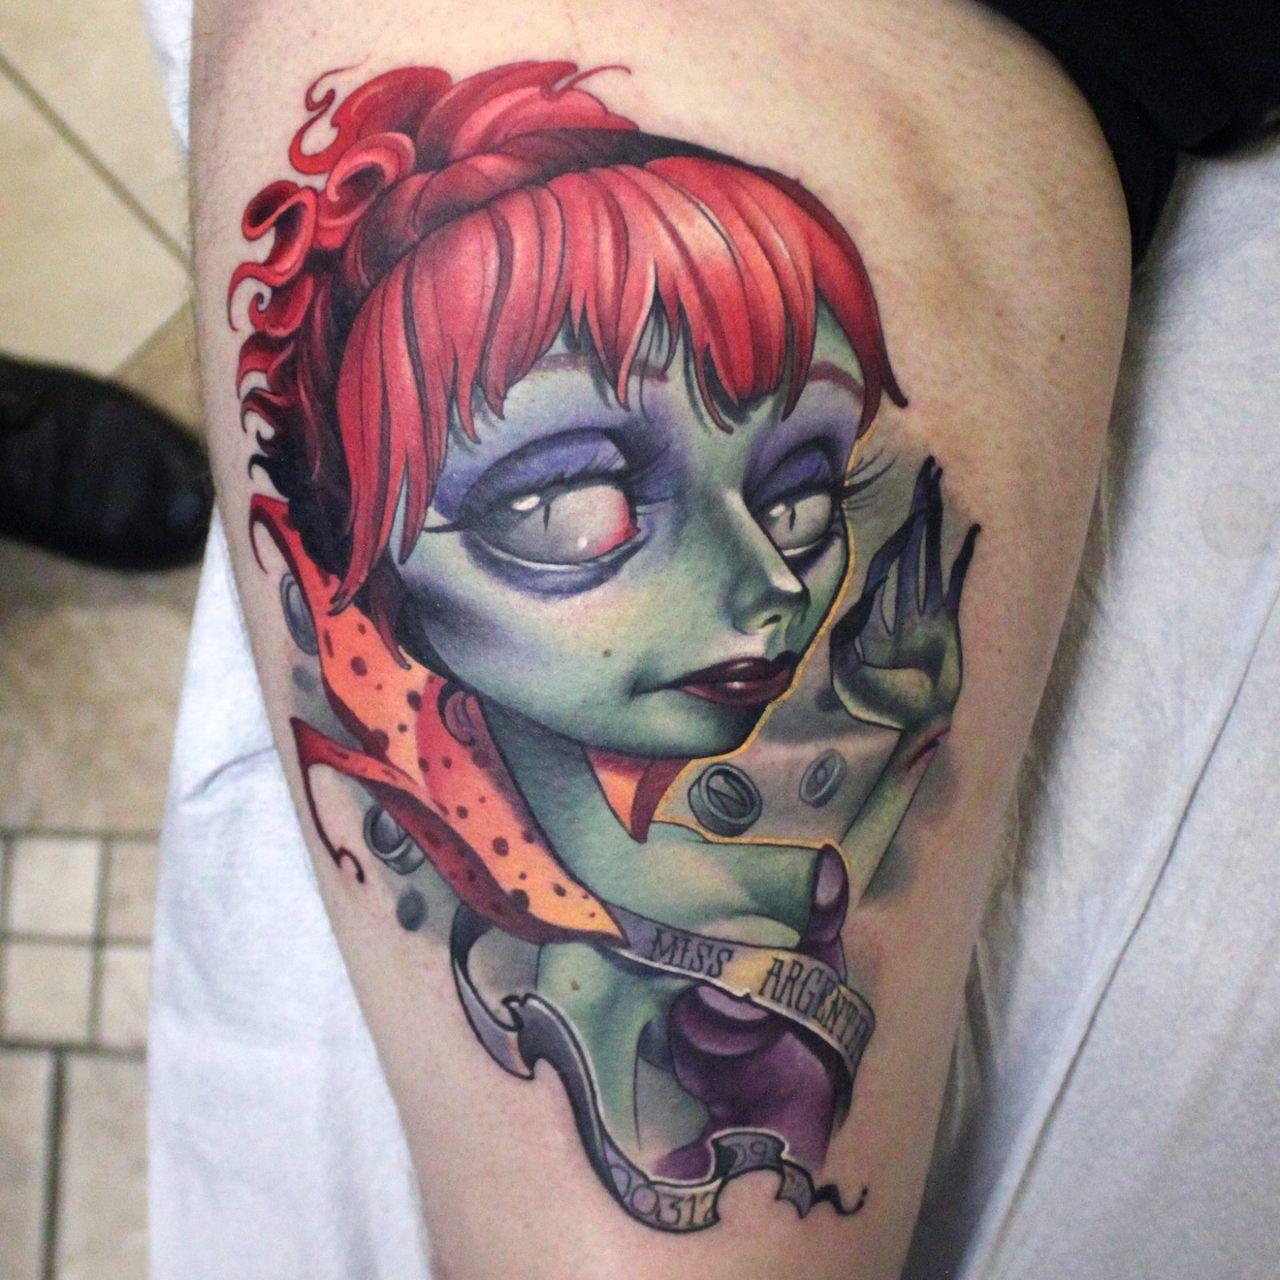 Kelly Doty Studio 13 Tattoos New School Tattoo - Miss Argentina from Beetlejuice